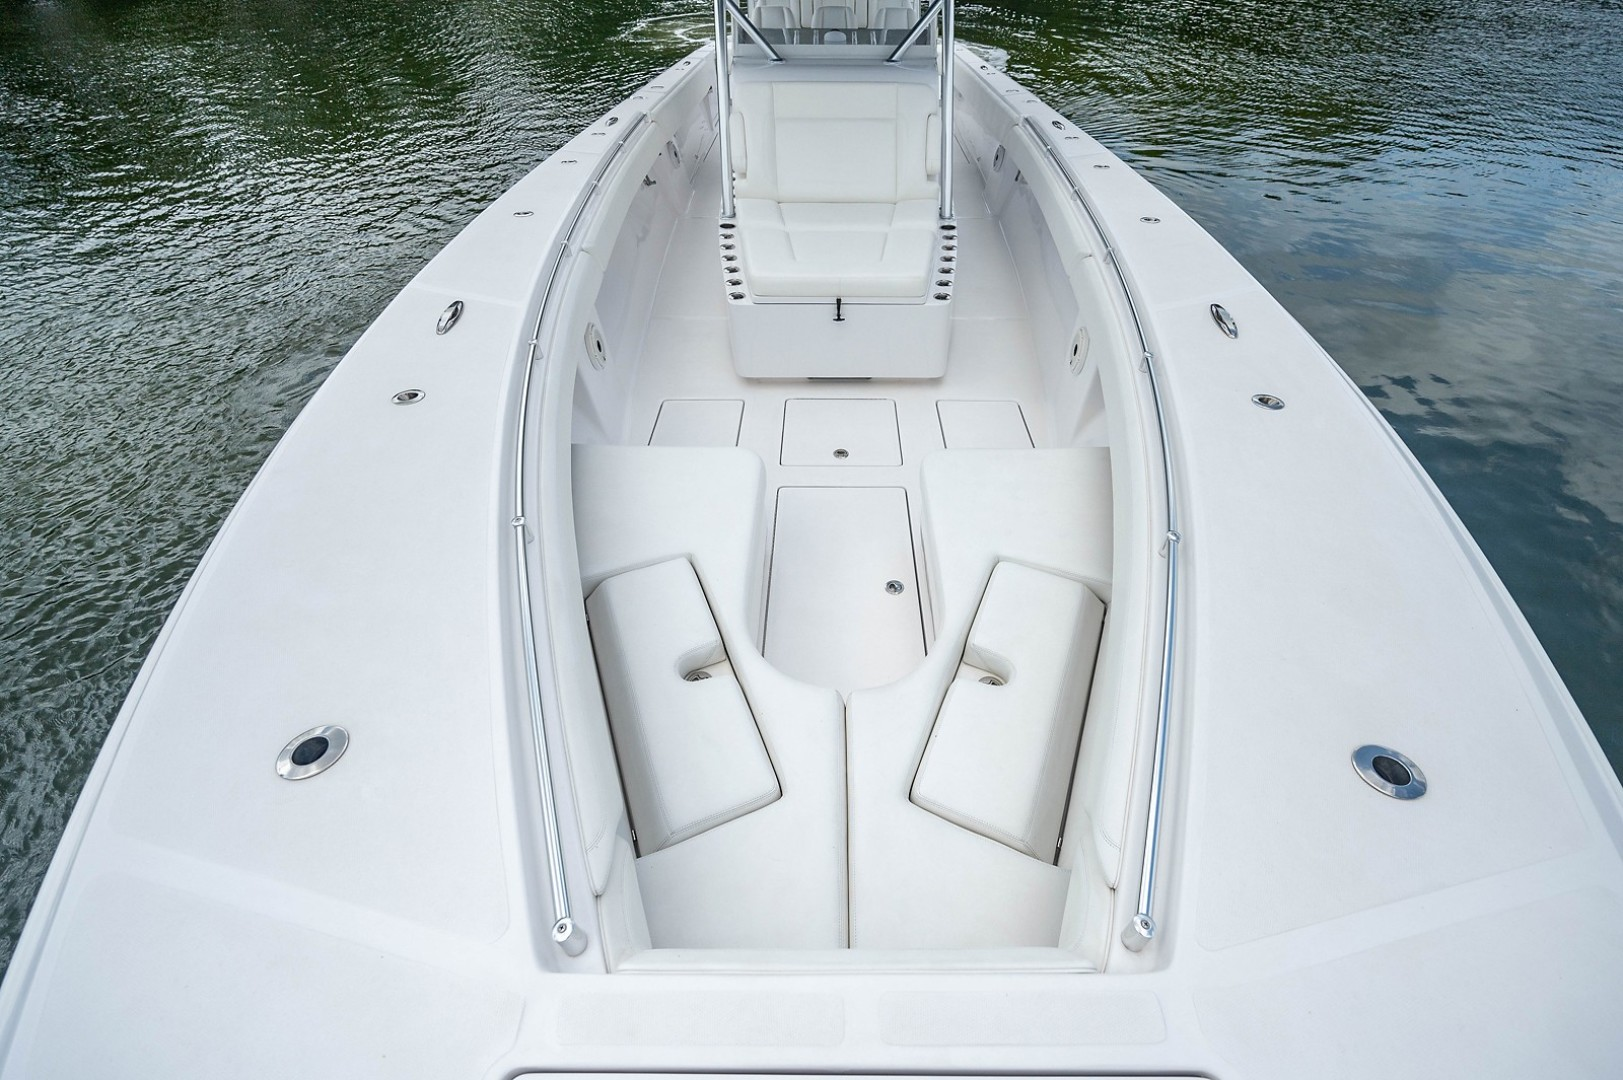 SeaHunter 45 - Medium Rare - Bow